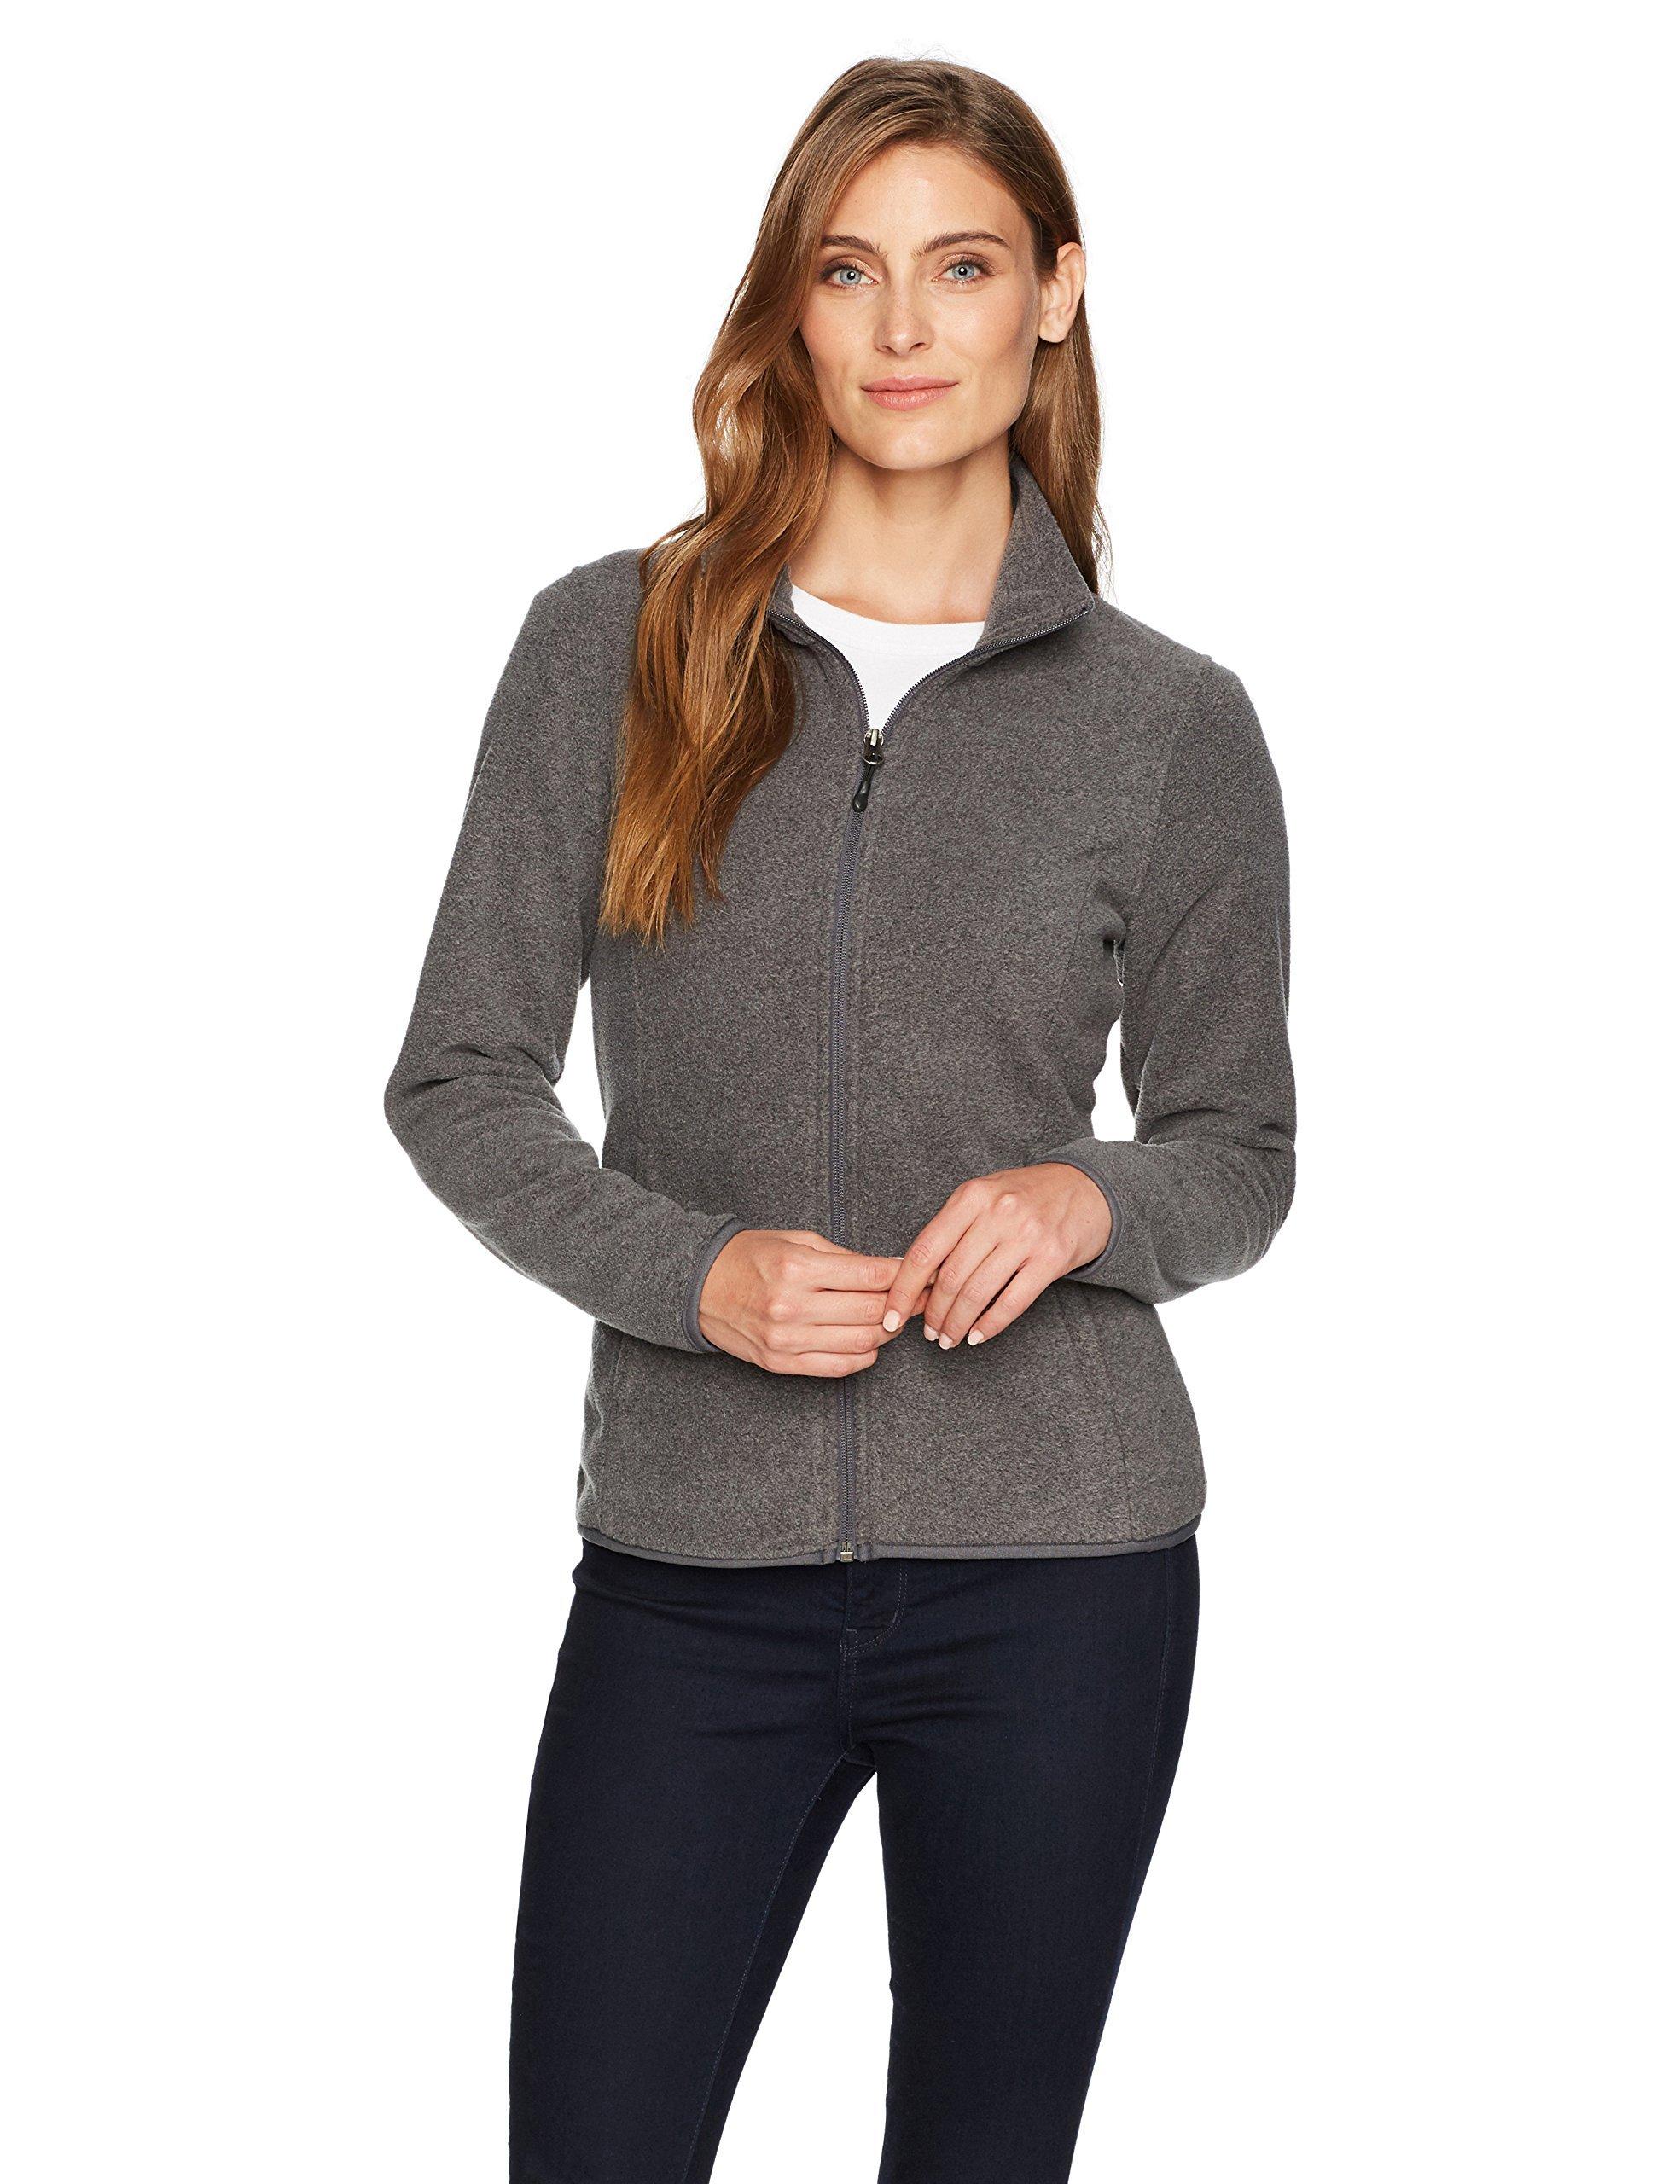 Amazon Essentials Womens Full-Zip Polar Fleece Jacket, Grey Charcoal Heather, Medium